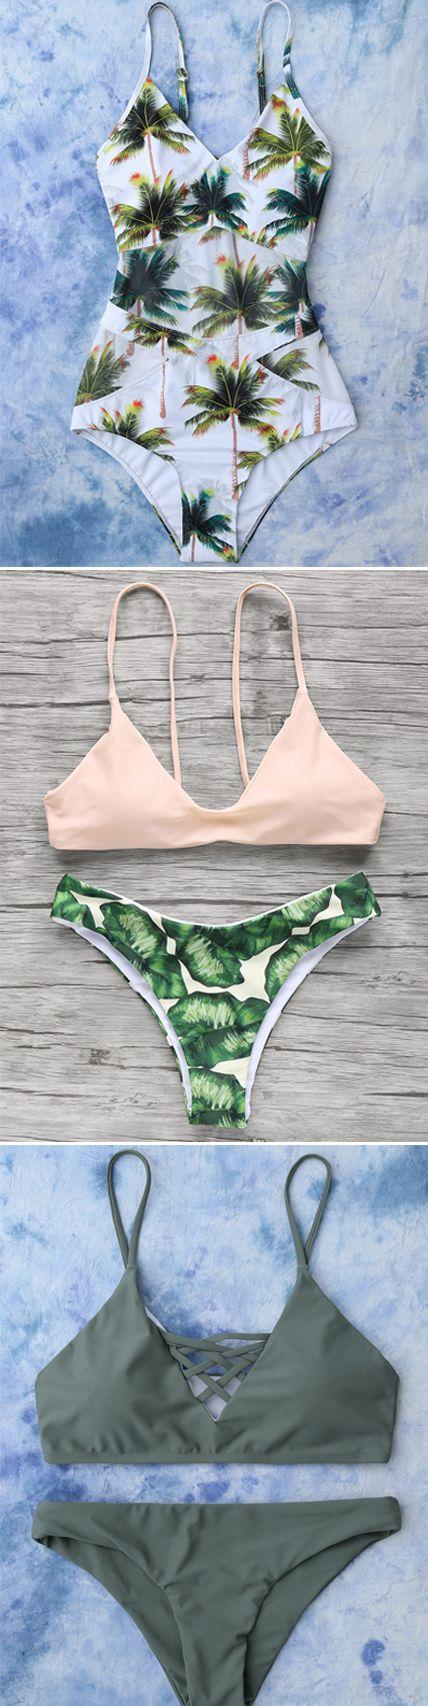 Touching the natural skin: Greenery Clothing | swimwear,bikini,one pieces,dress,dresses,tops,women fashion | #Greenery